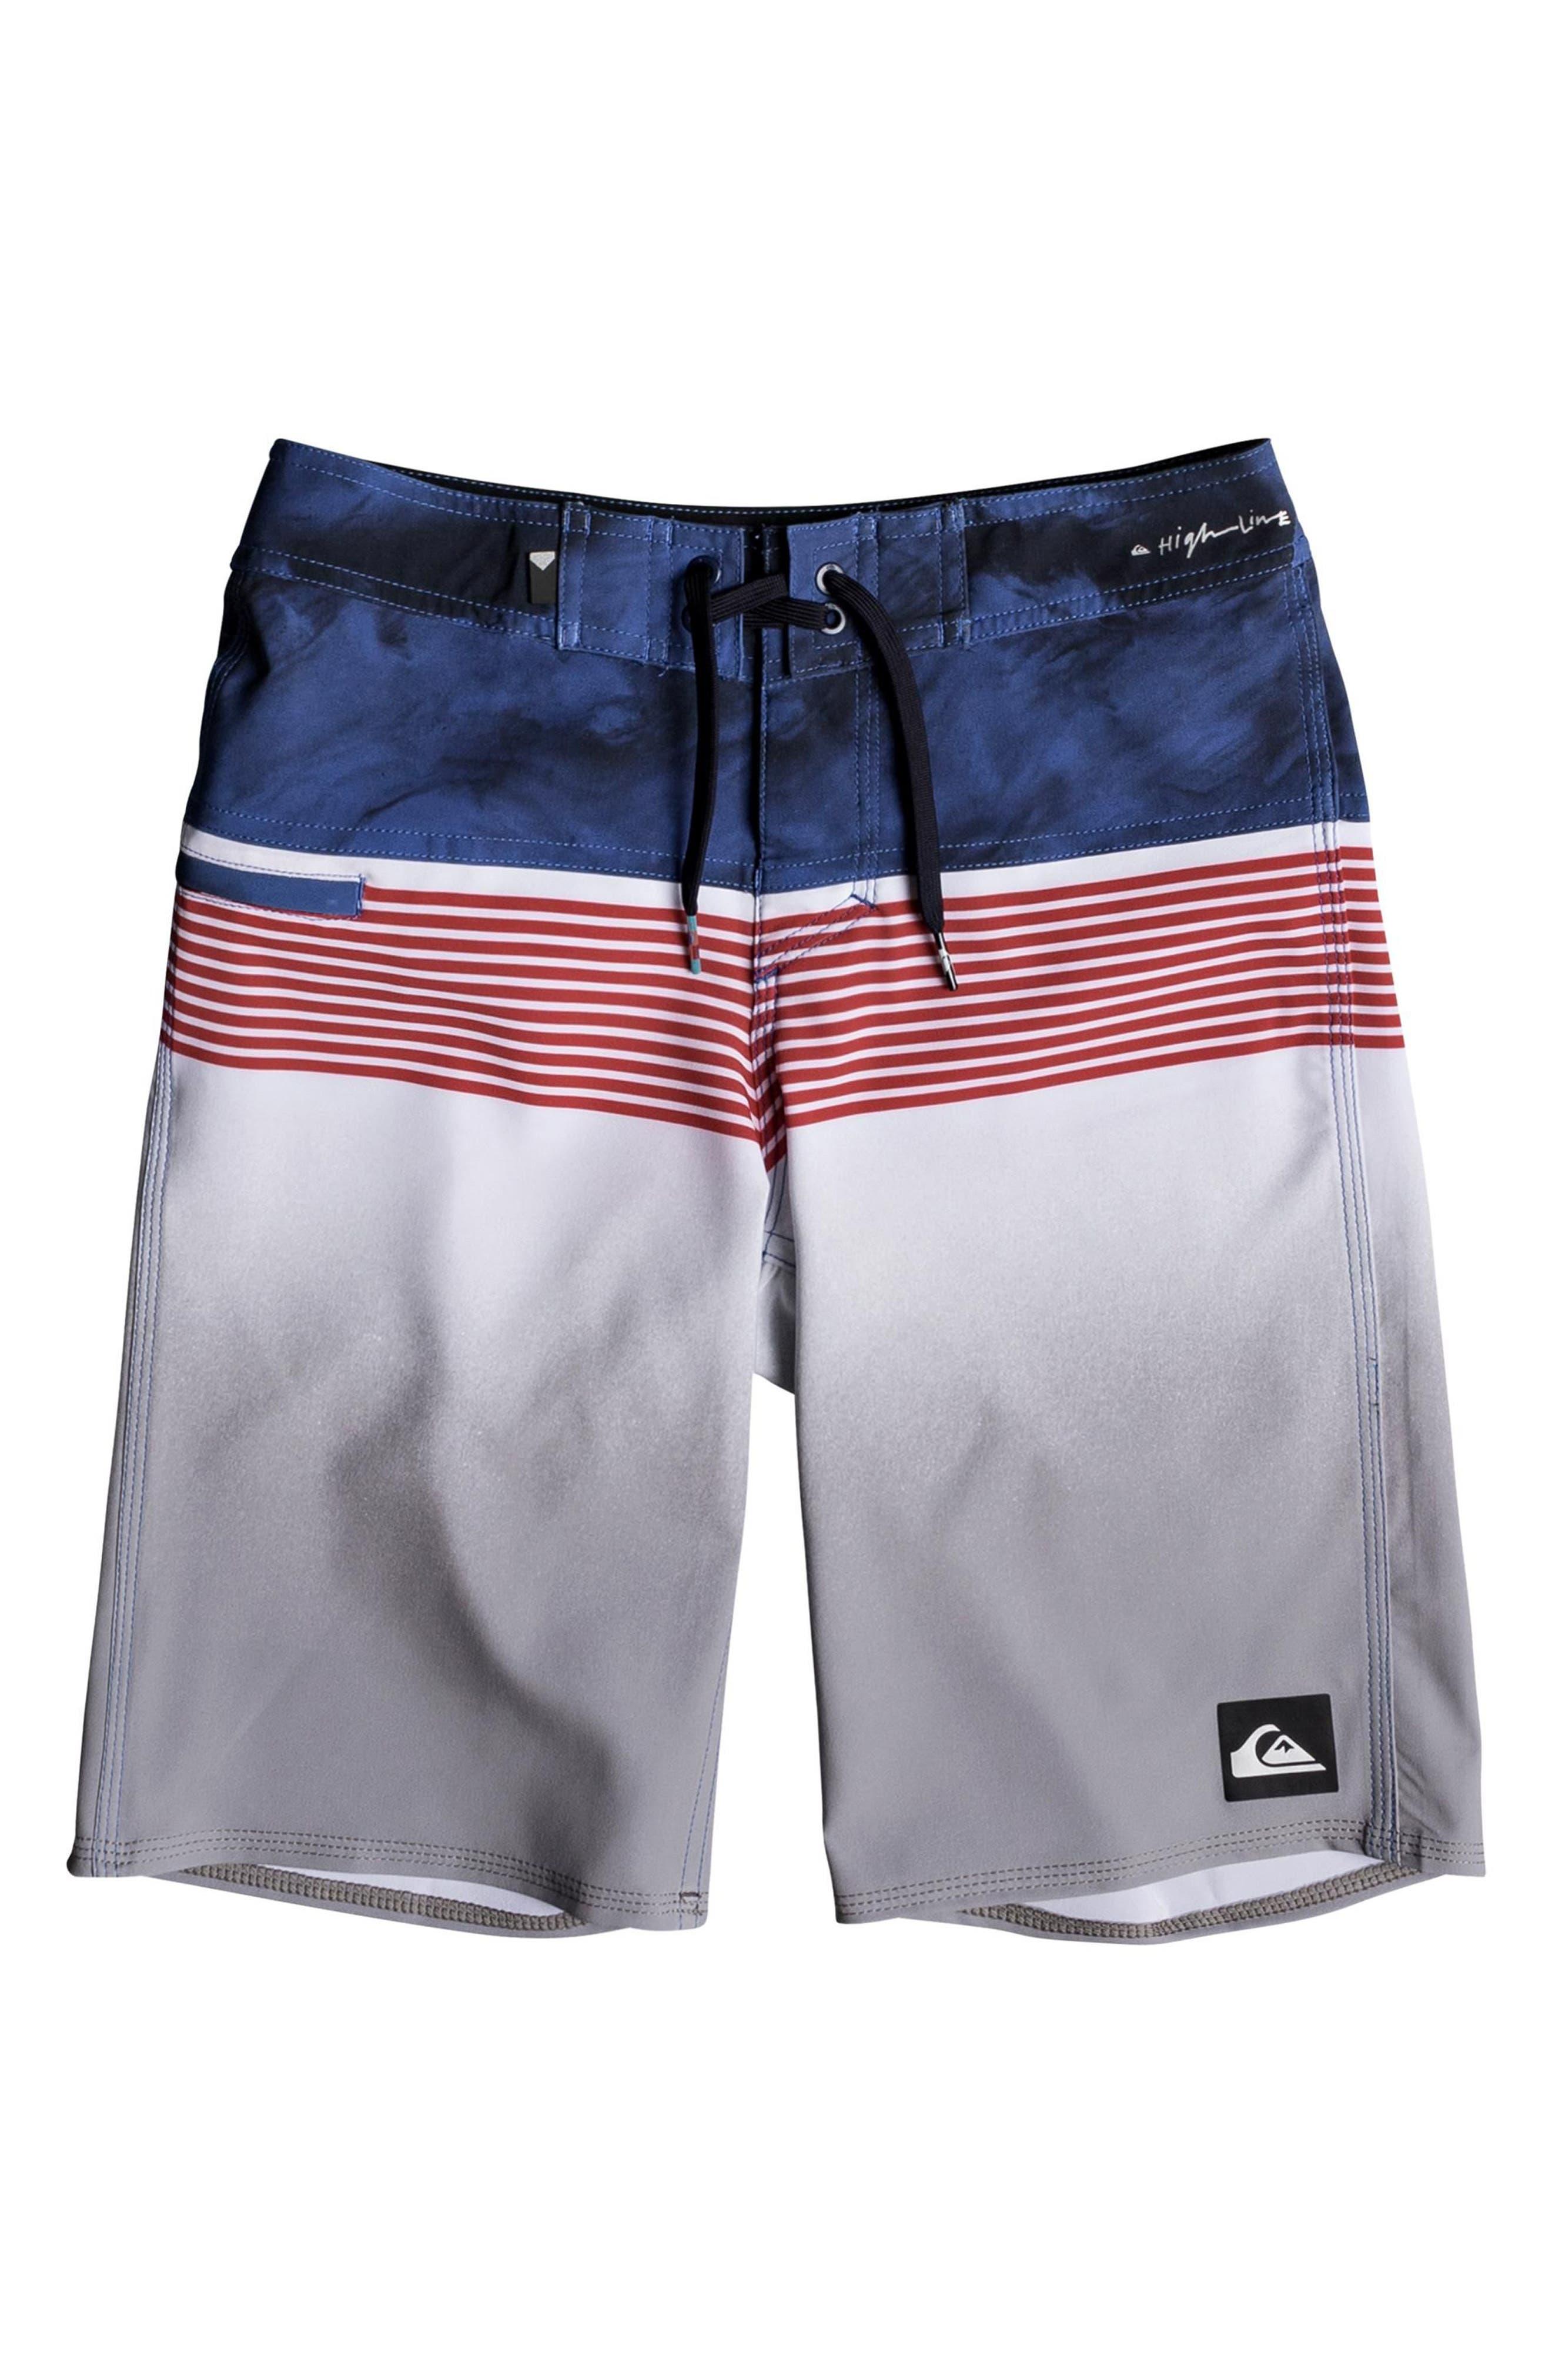 Highline Lava Board Shorts,                             Main thumbnail 1, color,                             101